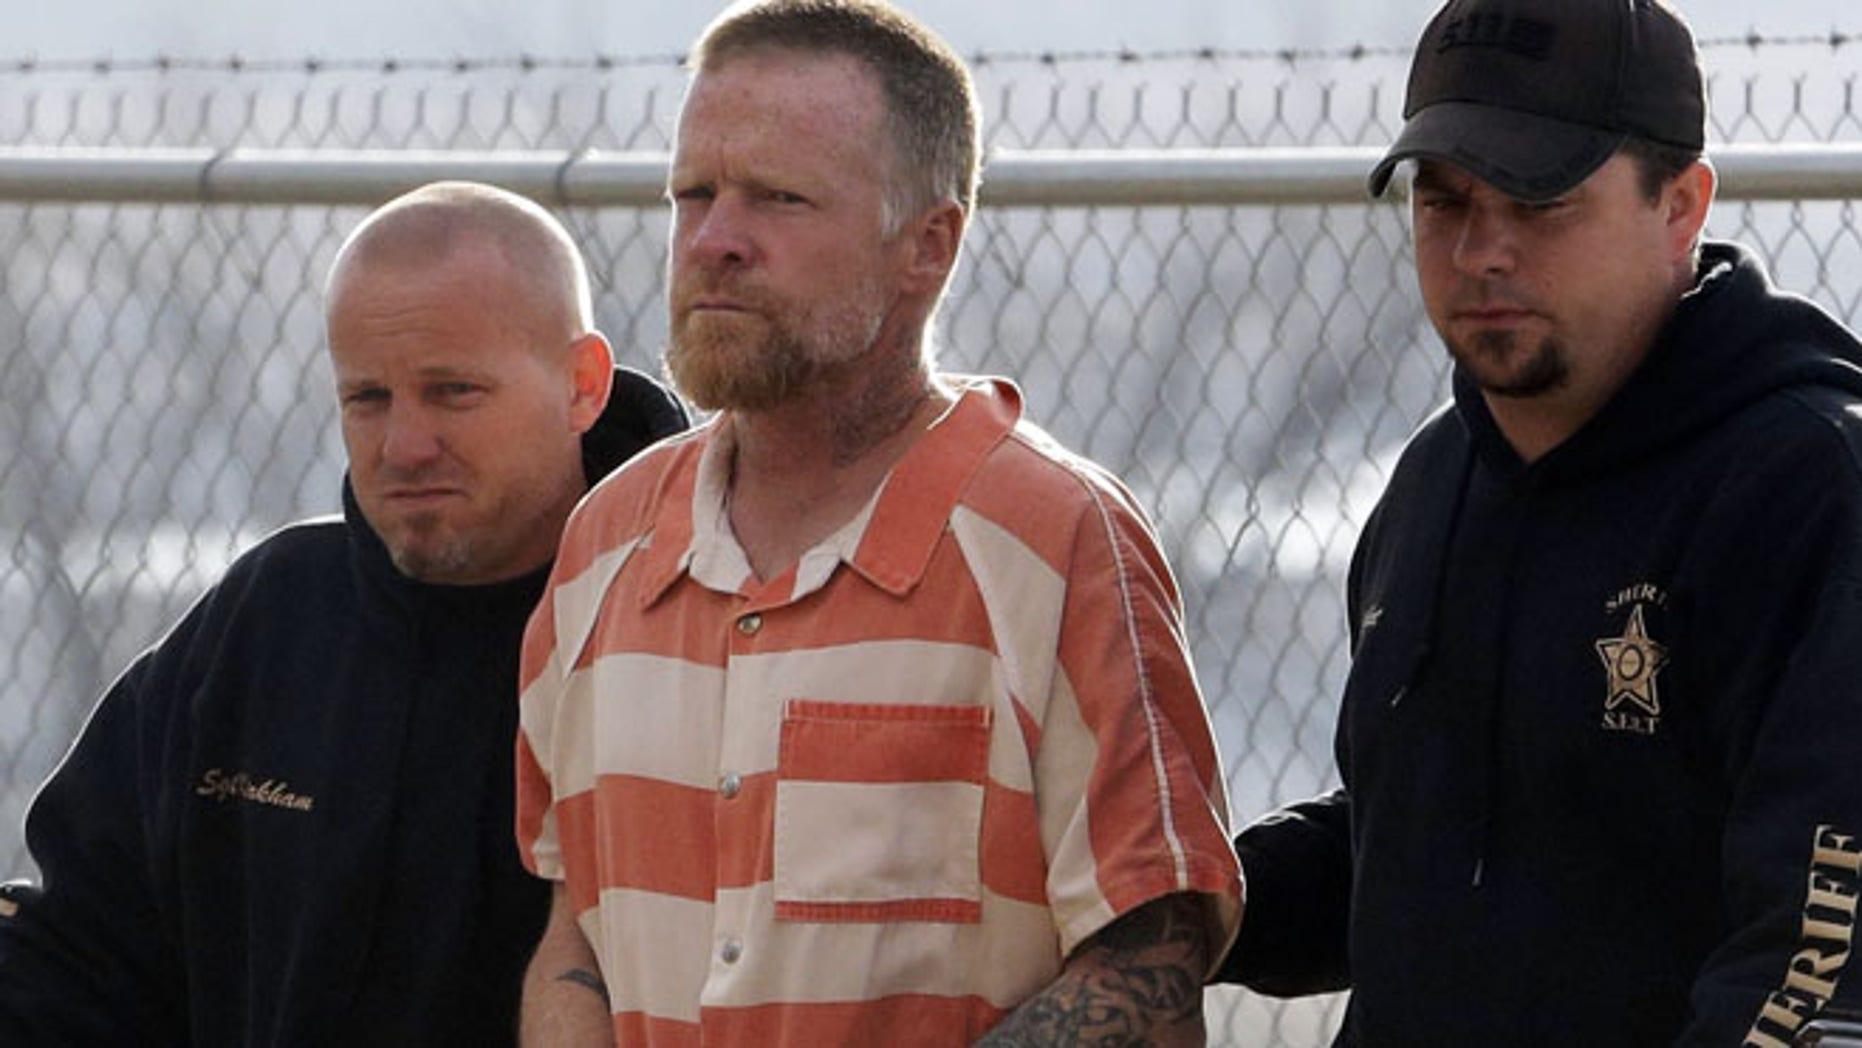 April 2: Sanpete Sheriff's Officers escort Troy James Knapp, 45, to the Sanpete County Jail Tuesday in Manti, Utah